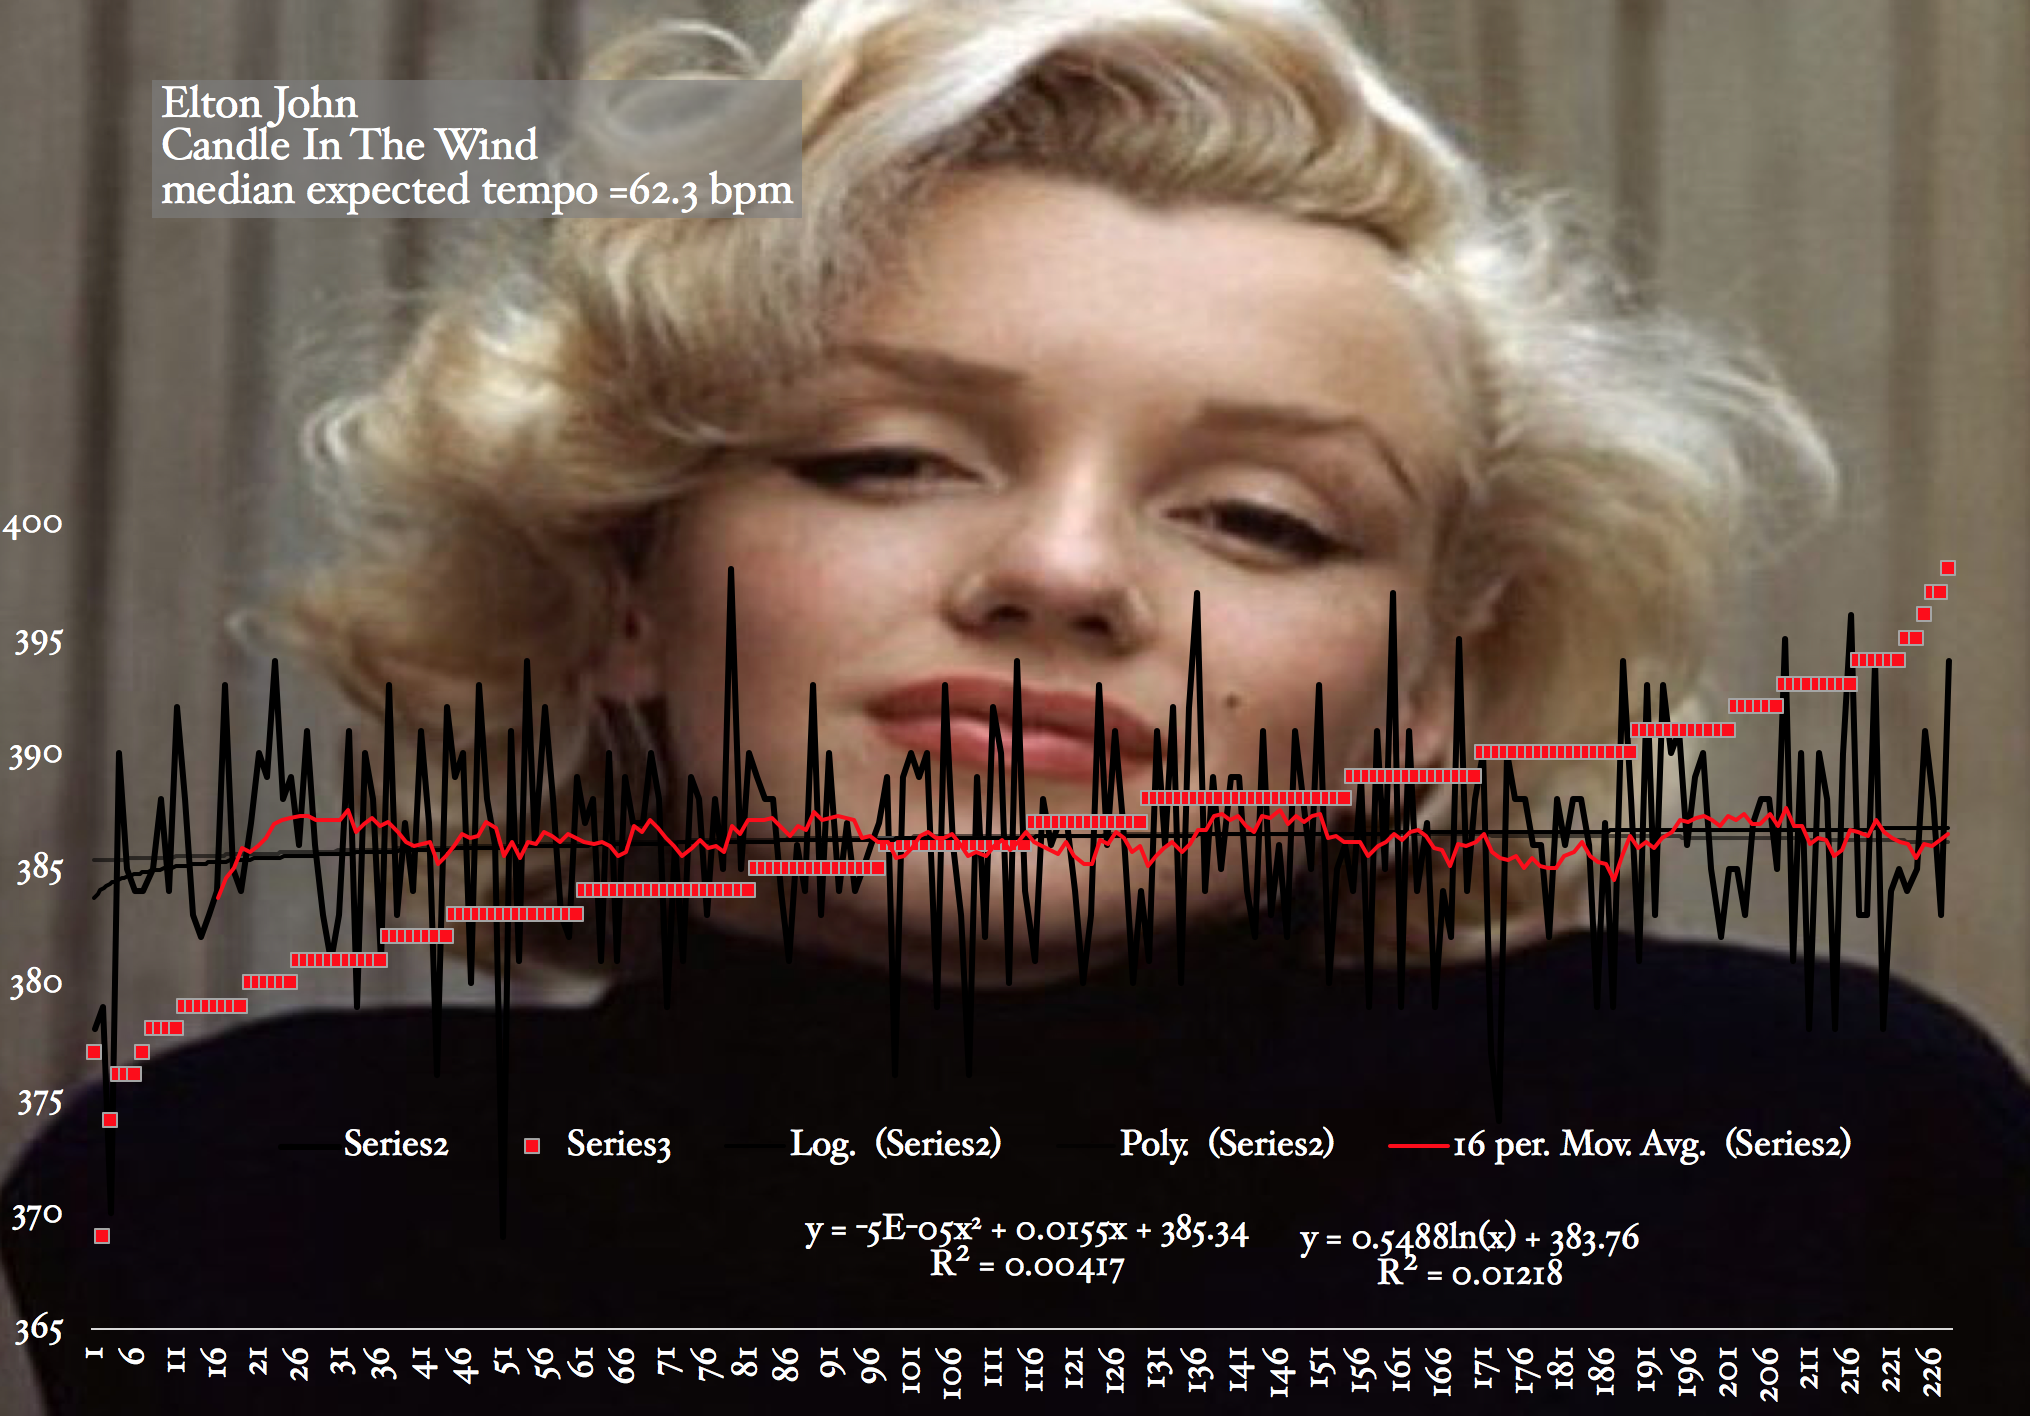 Candle-In-The=Wind-Elton-John-Marilyn-MOnroe-harmonic-rhythm-probability-chart